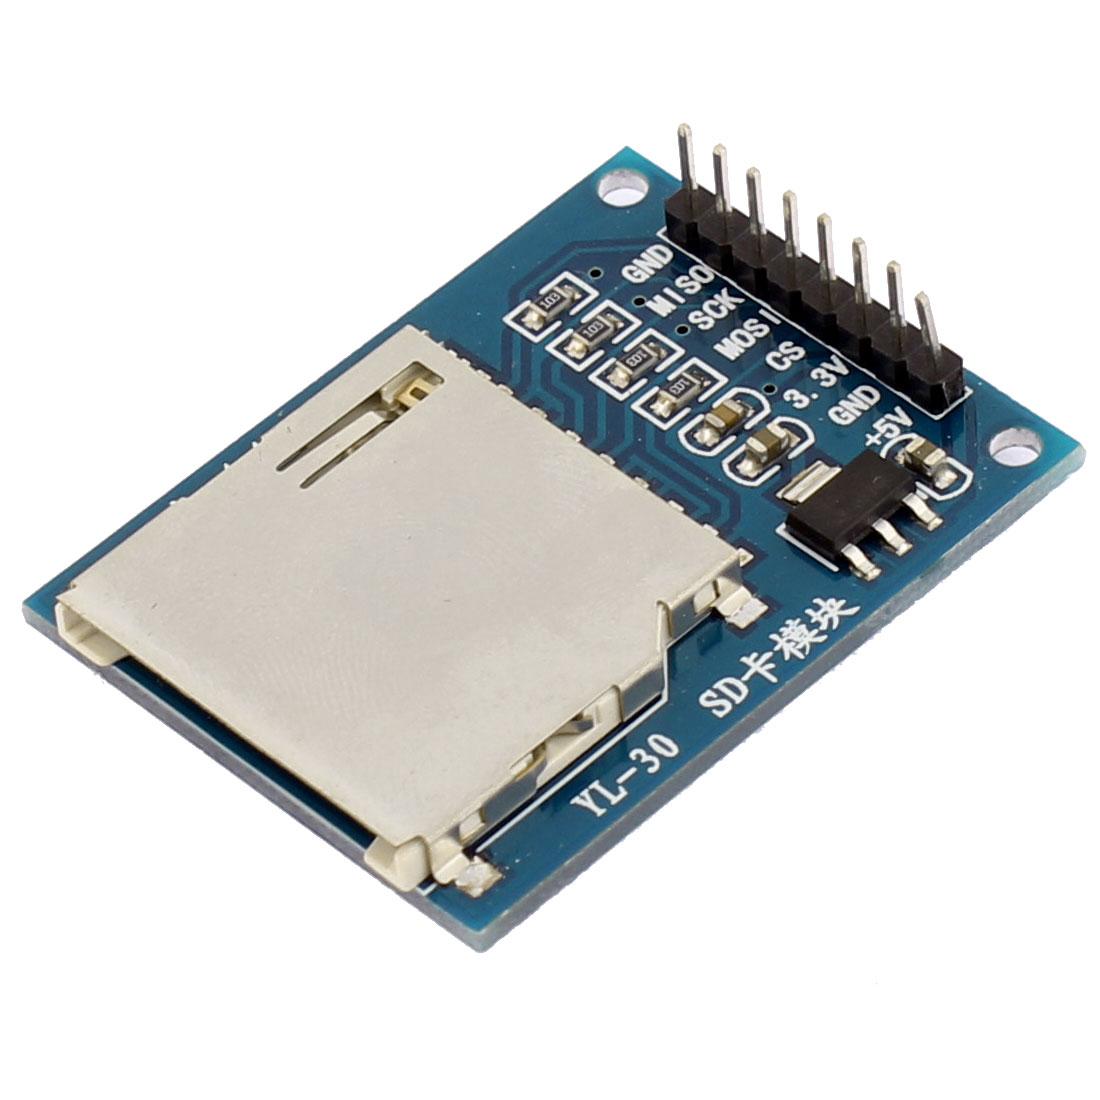 DC 3.3V/5V Read Write ARM MCU SD Card Module Slot Socket Reader